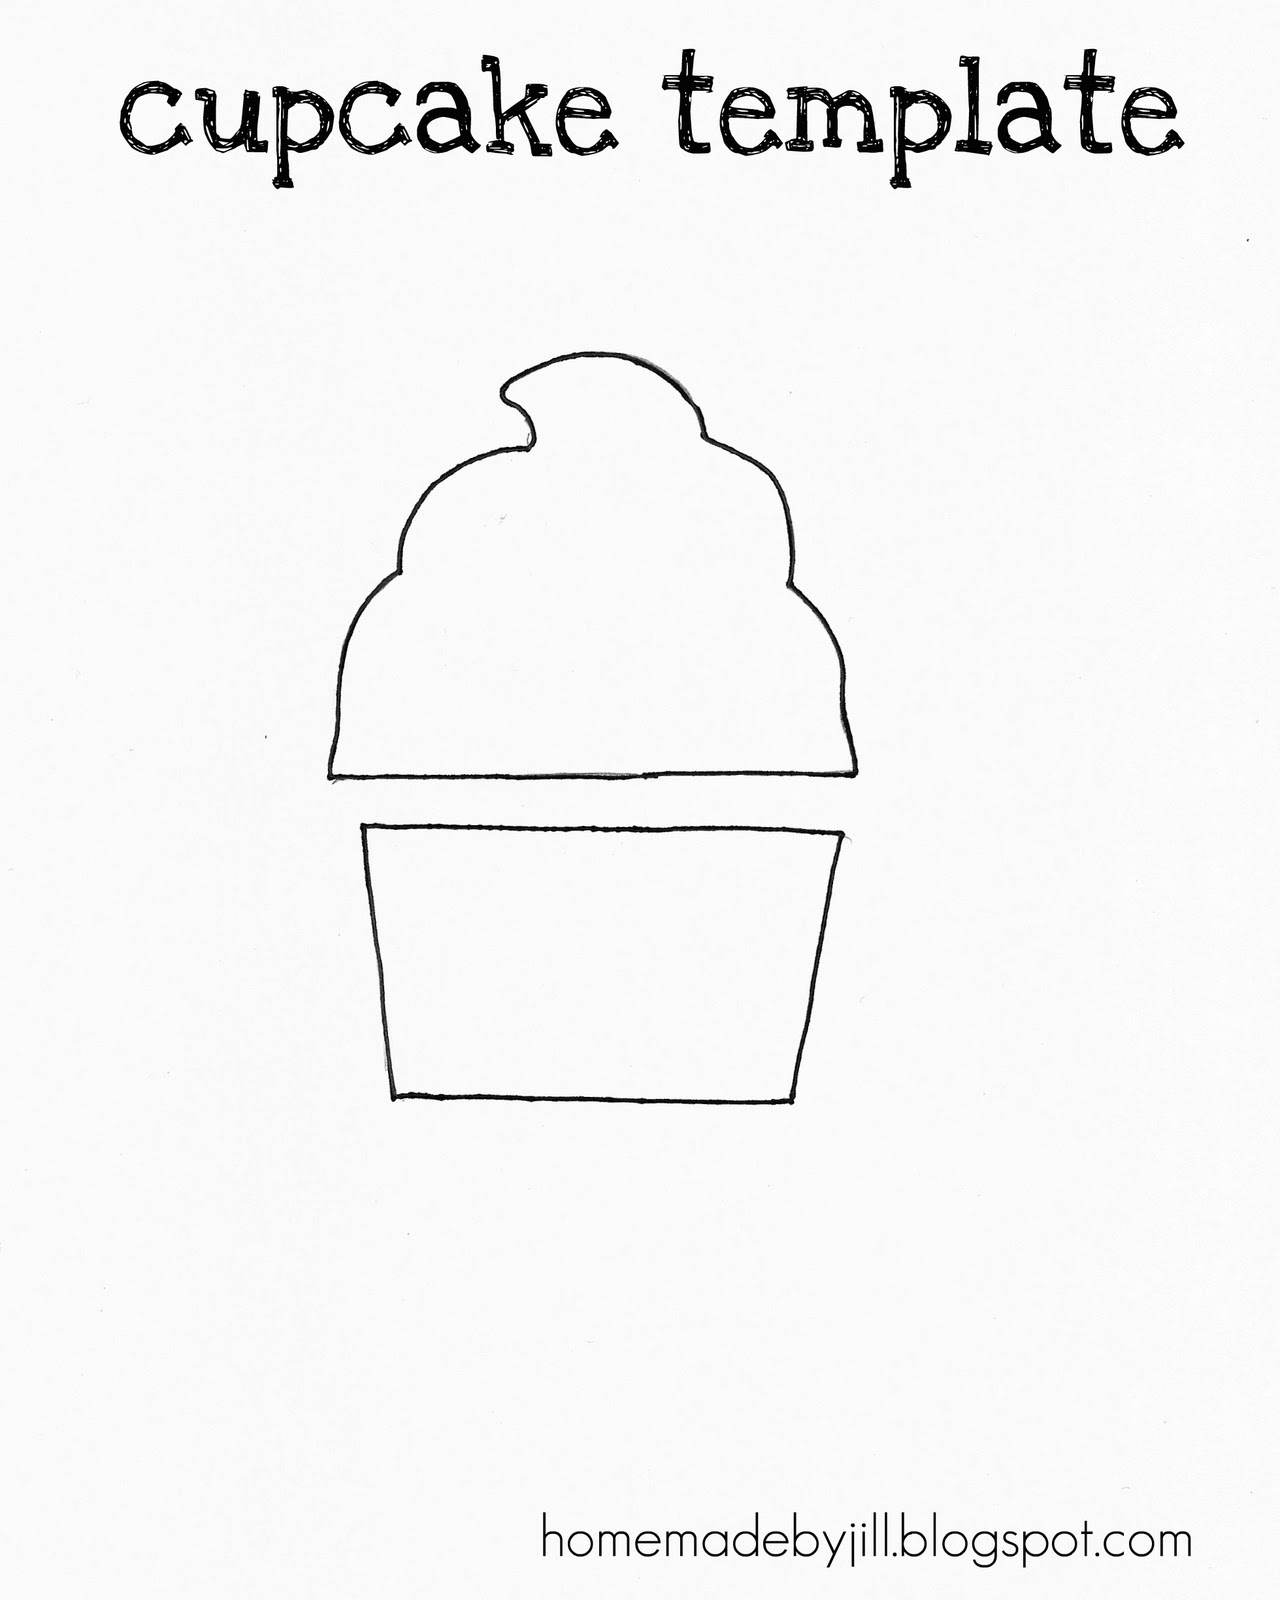 Cupcake Print Out